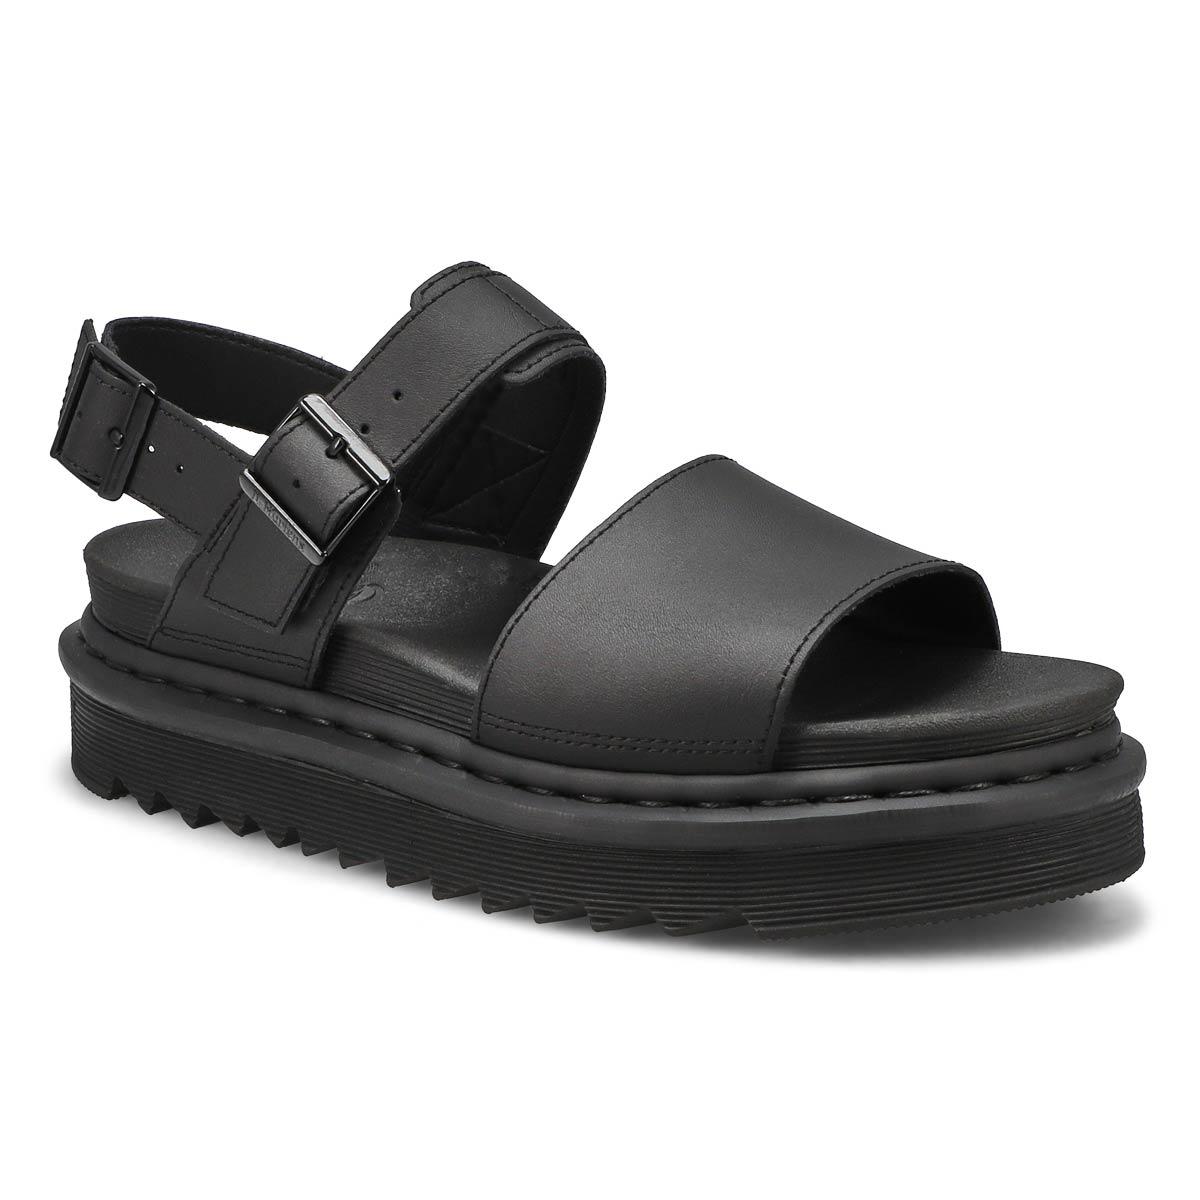 Lds Voss black 2 strap casual sandal